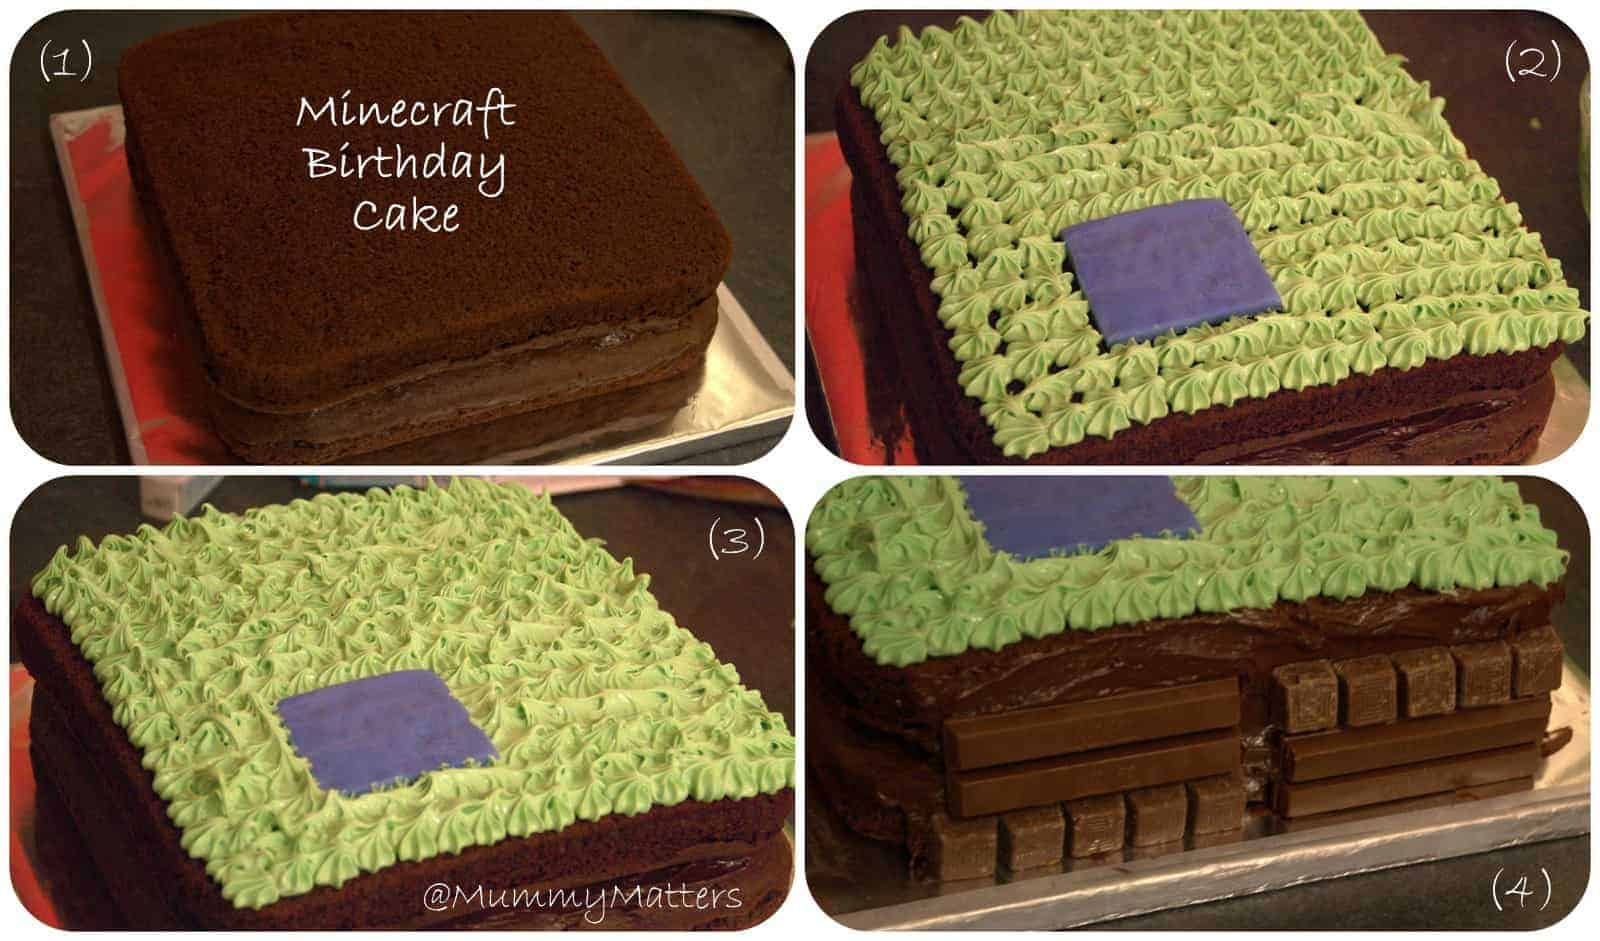 Minecraft Birthday Cake for Curly